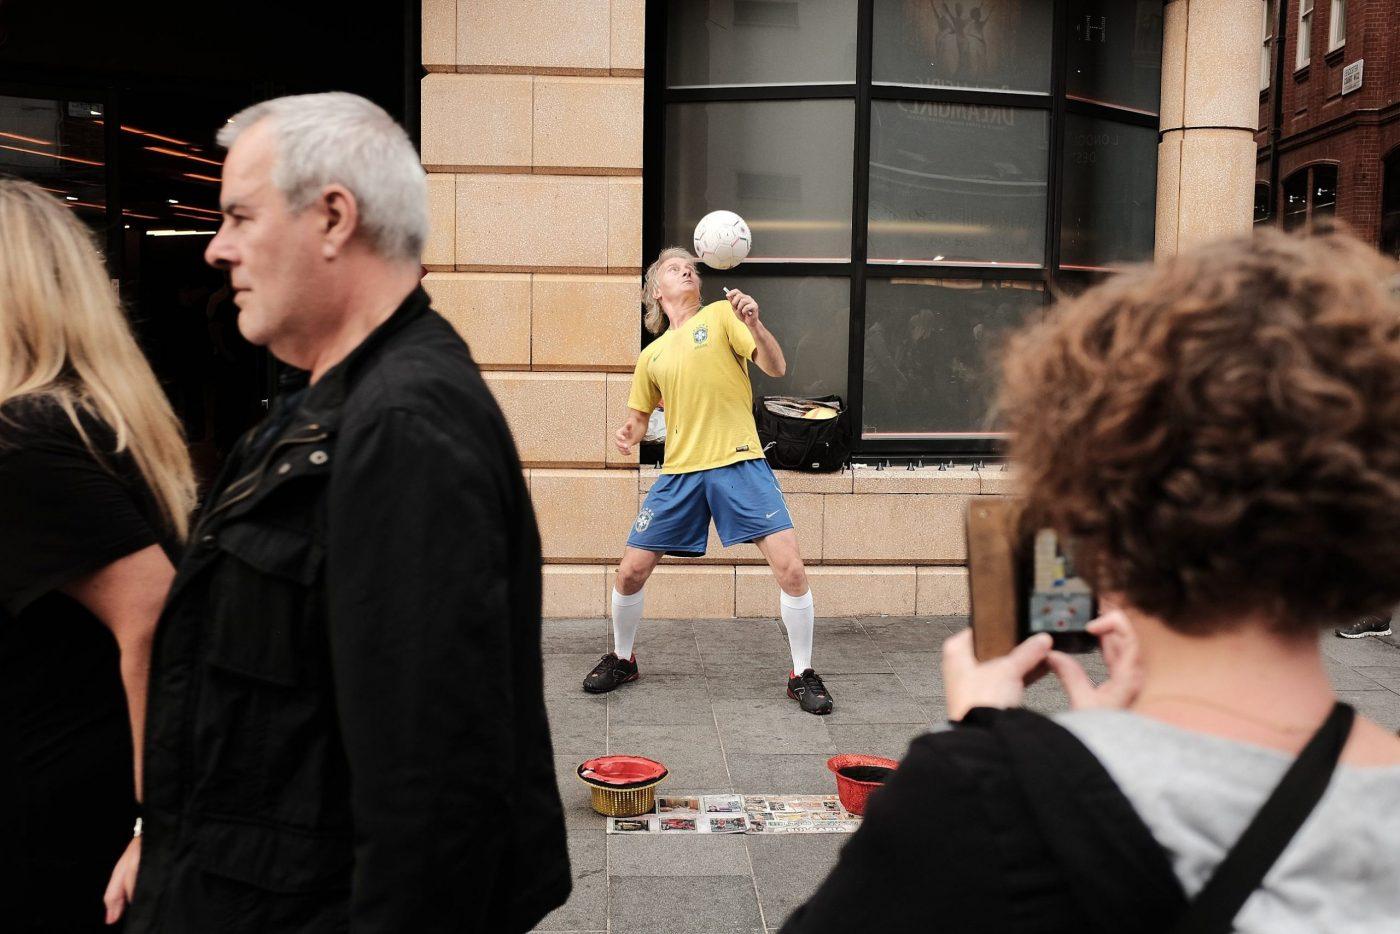 street footballer London showing skills